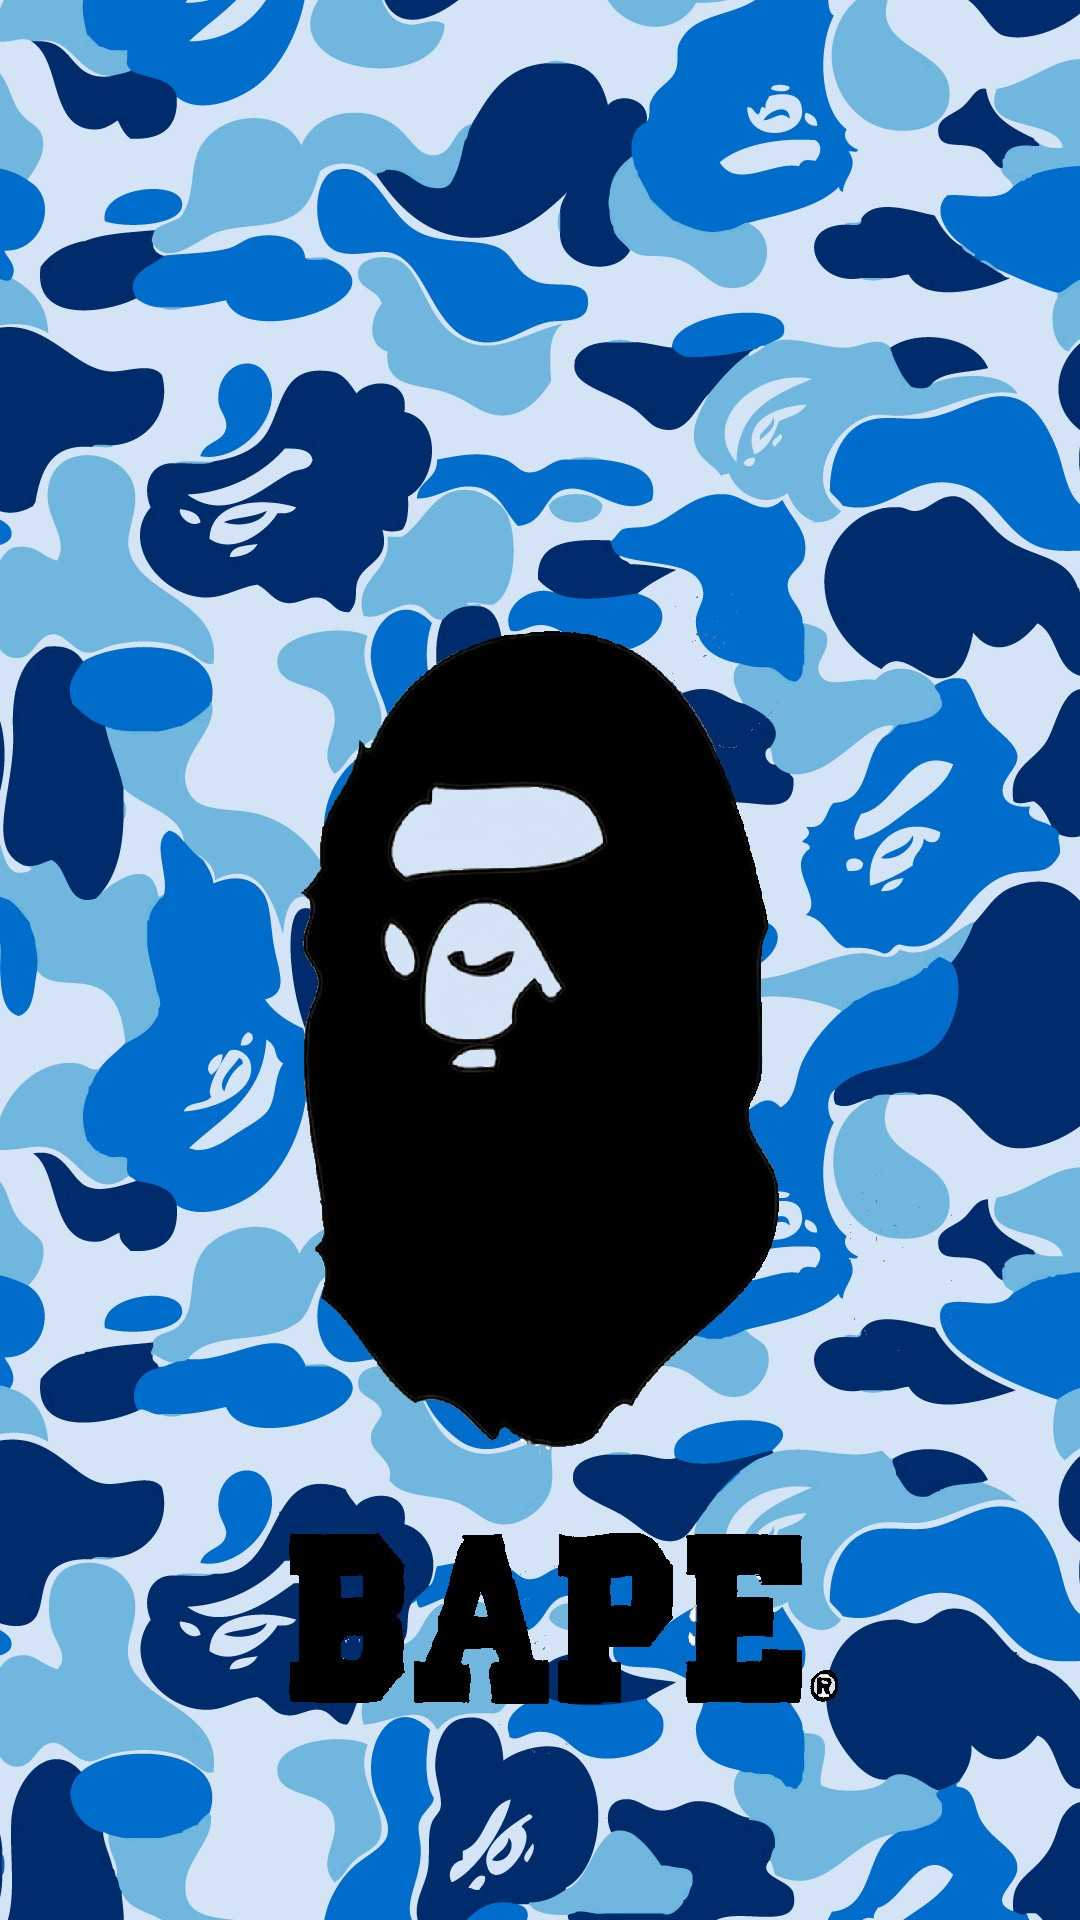 Blue bape live wallpaper